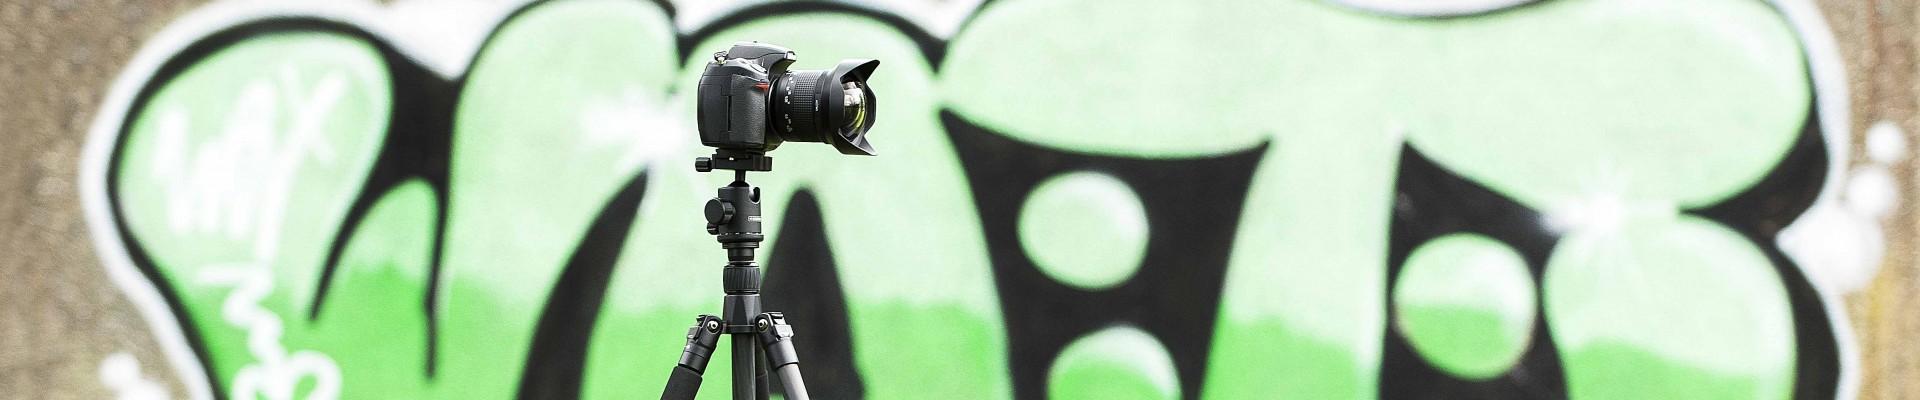 Caruba: großes Sortiment an Foto- und Videozubehör